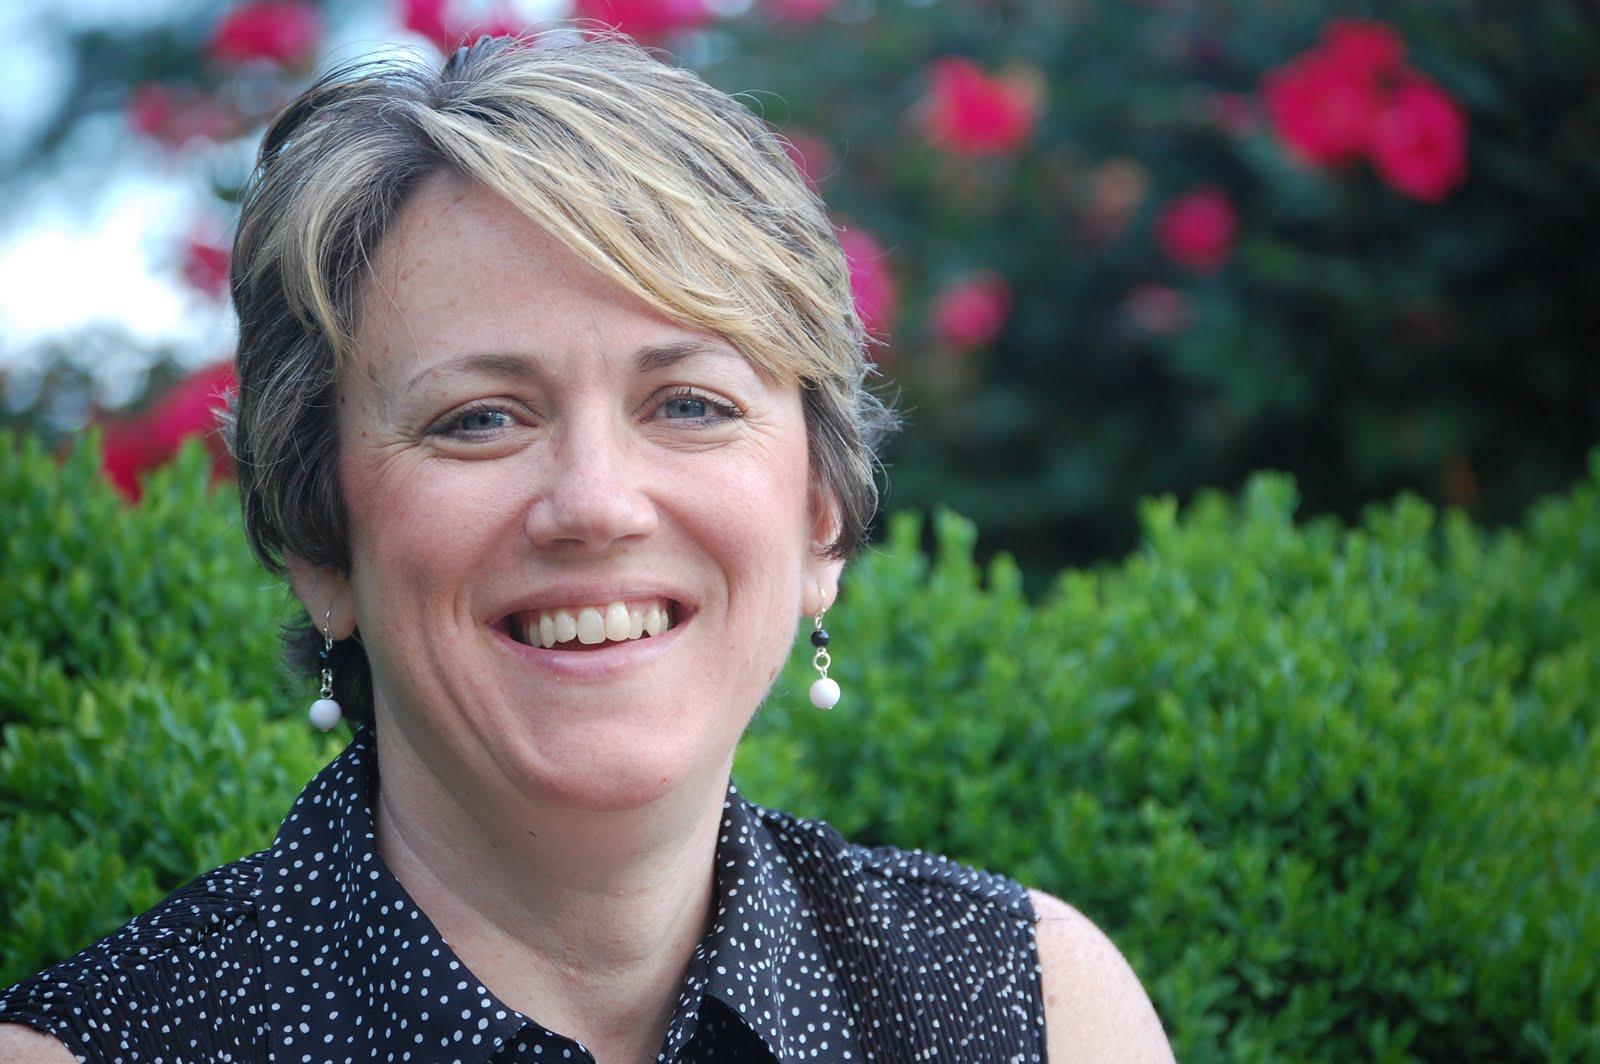 Sharon Brobst